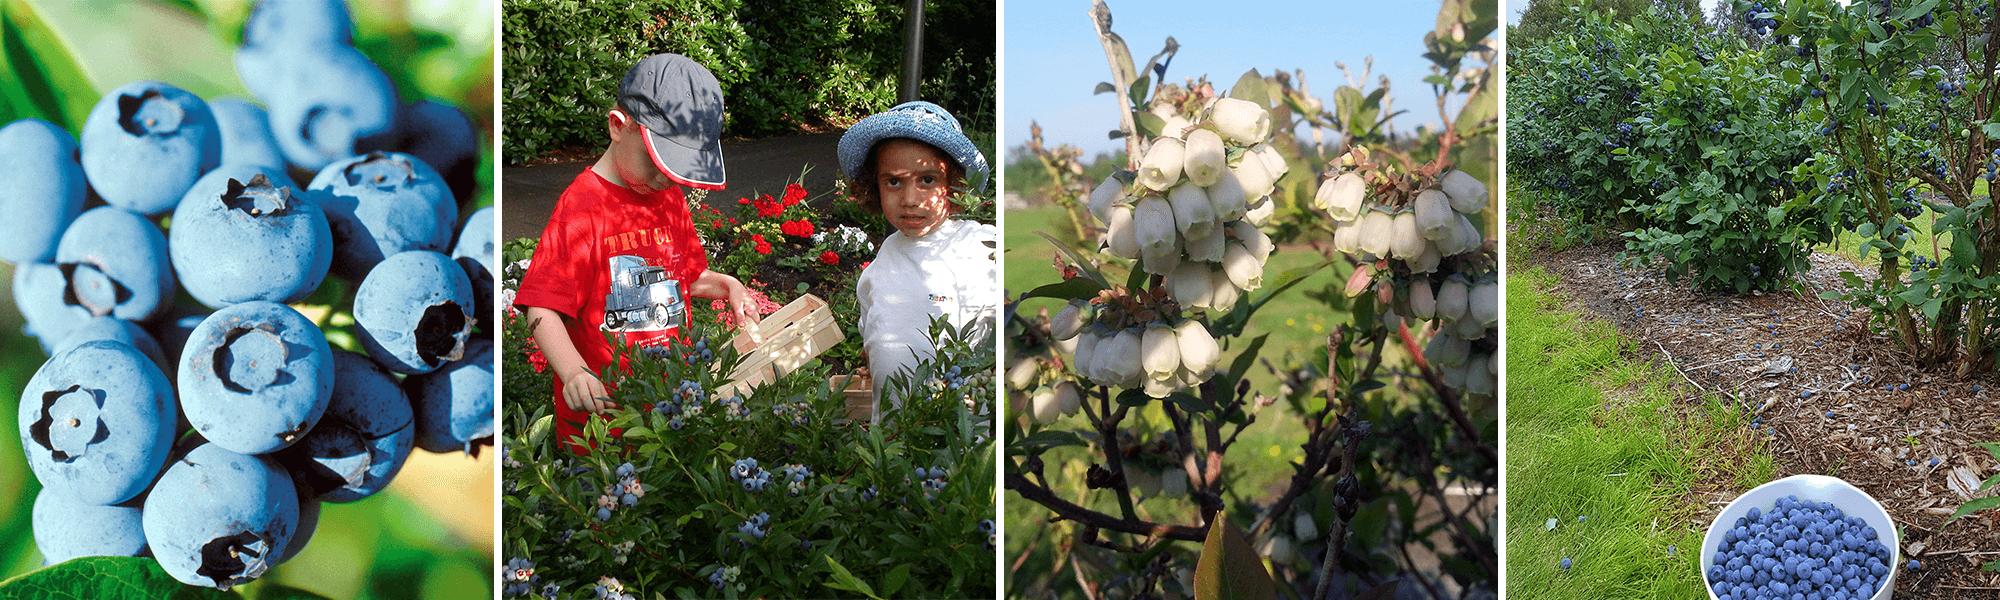 Halskenbjerg er Danmarks største blåbær plantage